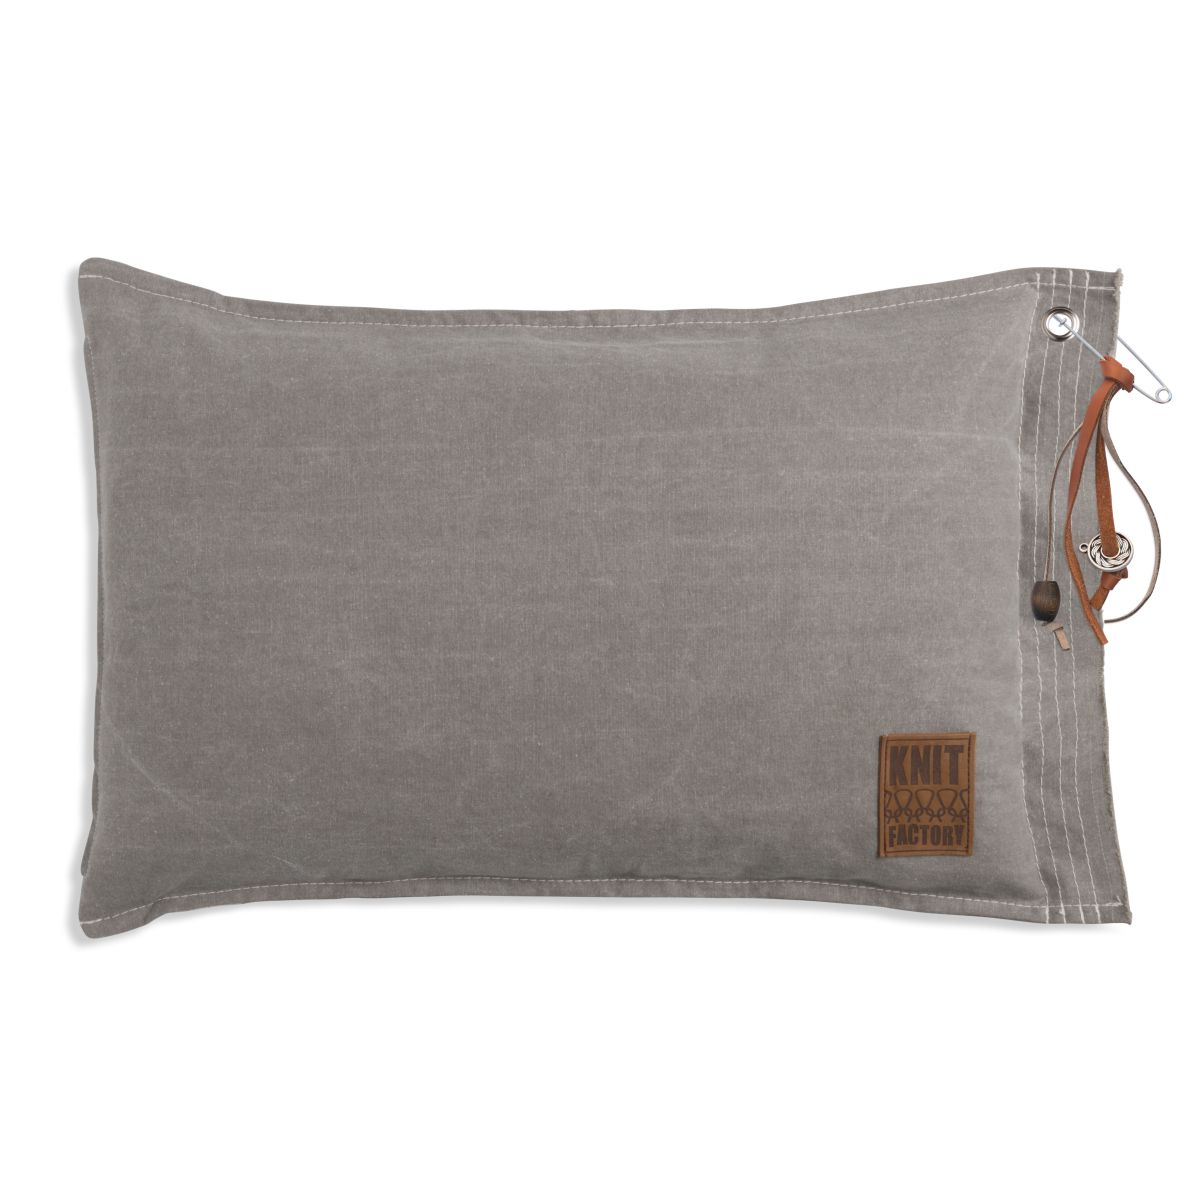 knit factory 1061309 mara kussen60x40 stone green 1